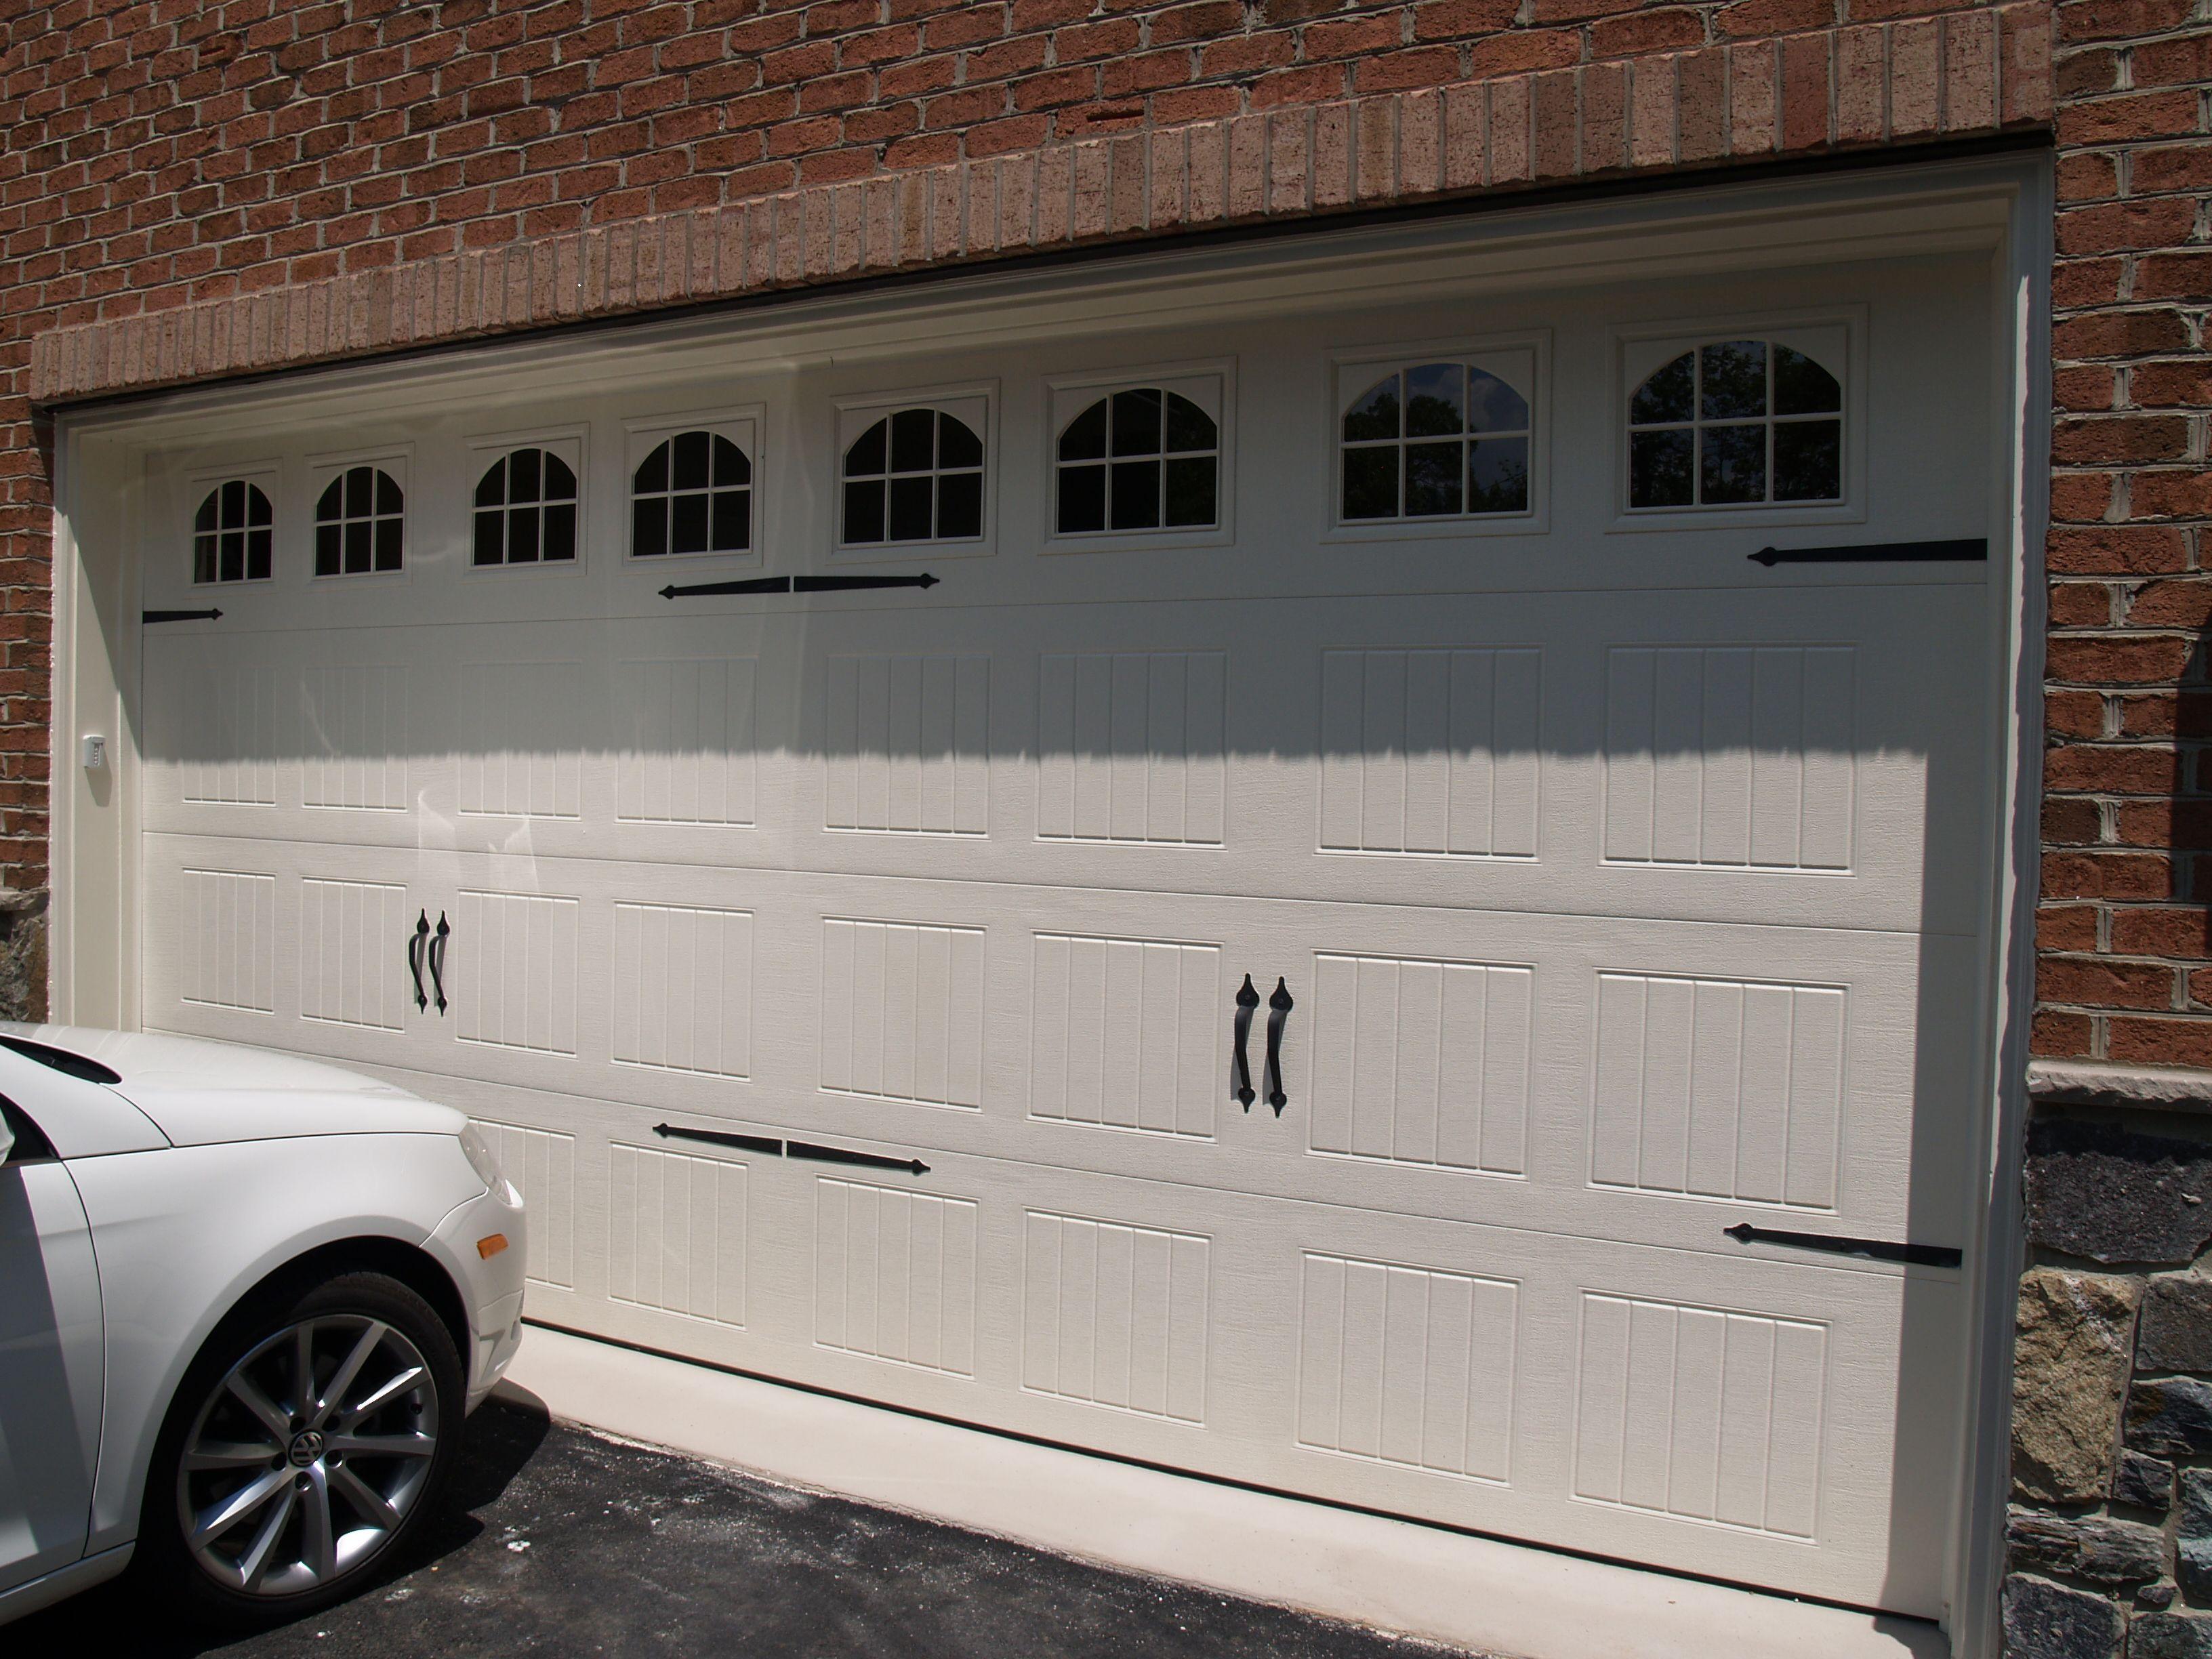 Fill The Largest Opening In Your Home With A Wayne Dalton Premium Insulated Focal Point Visit Show Garage Door Makeover Garage Doors Wayne Dalton Garage Doors